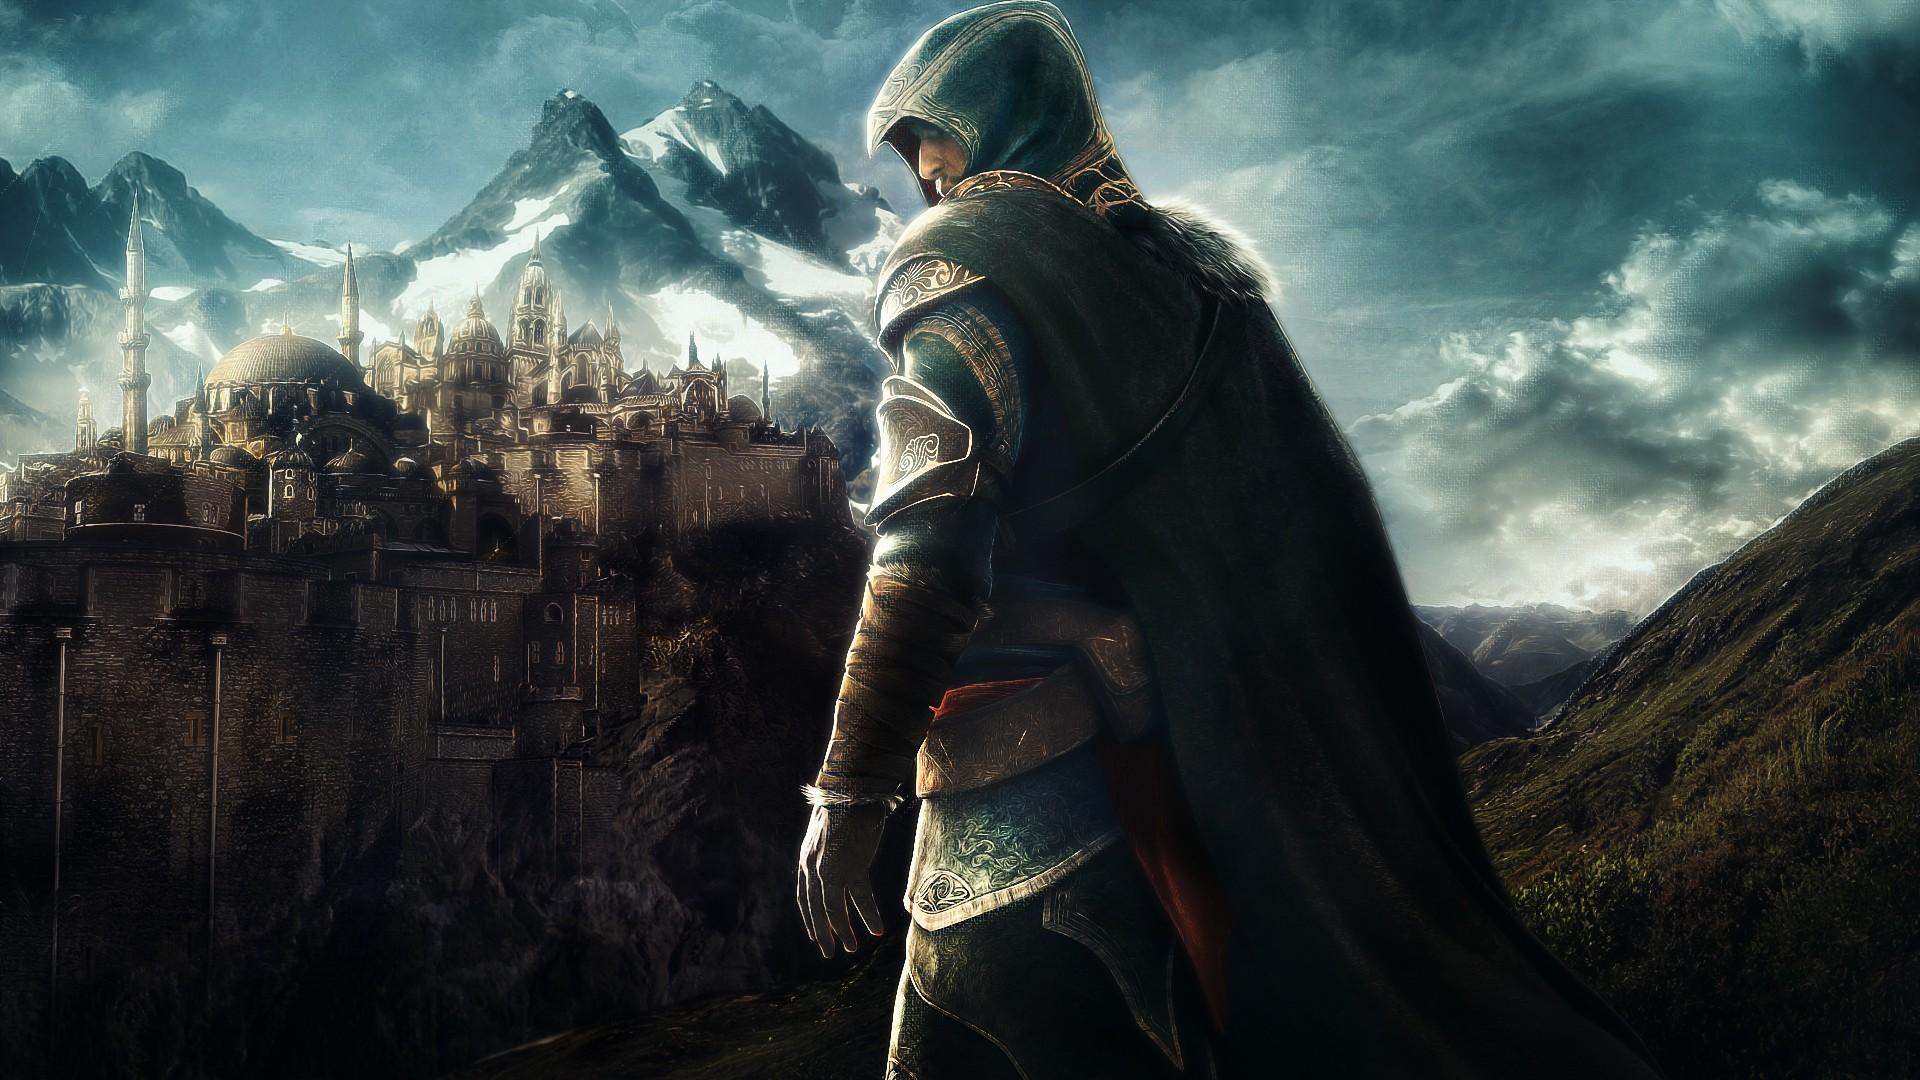 Wallpaper 1920x1080 Px Assassins Creed Revelations Ezio